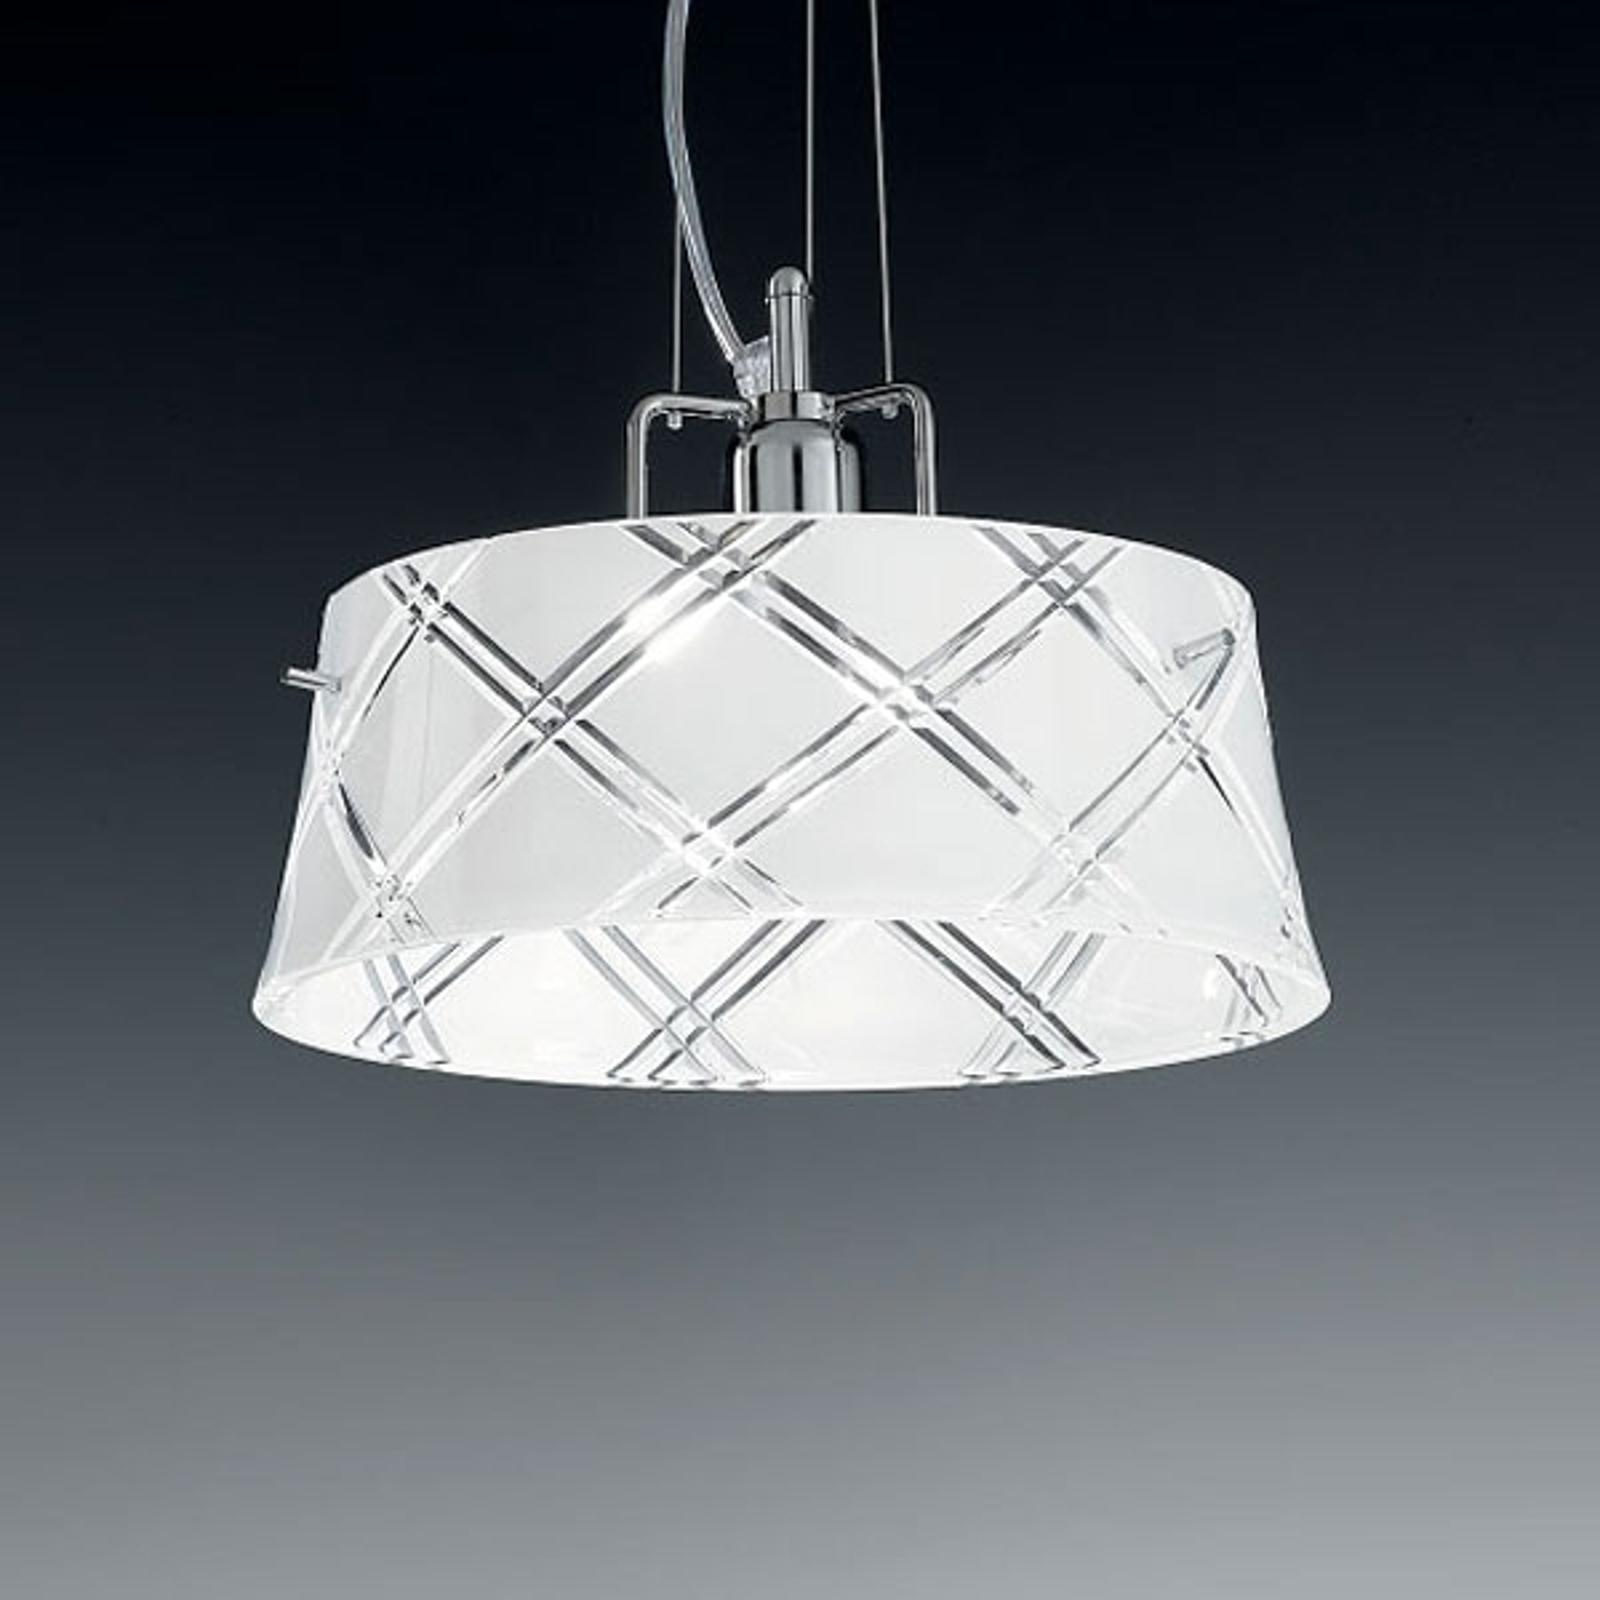 Elegant hengelampe CORALLO 30, 1 lys, hvit